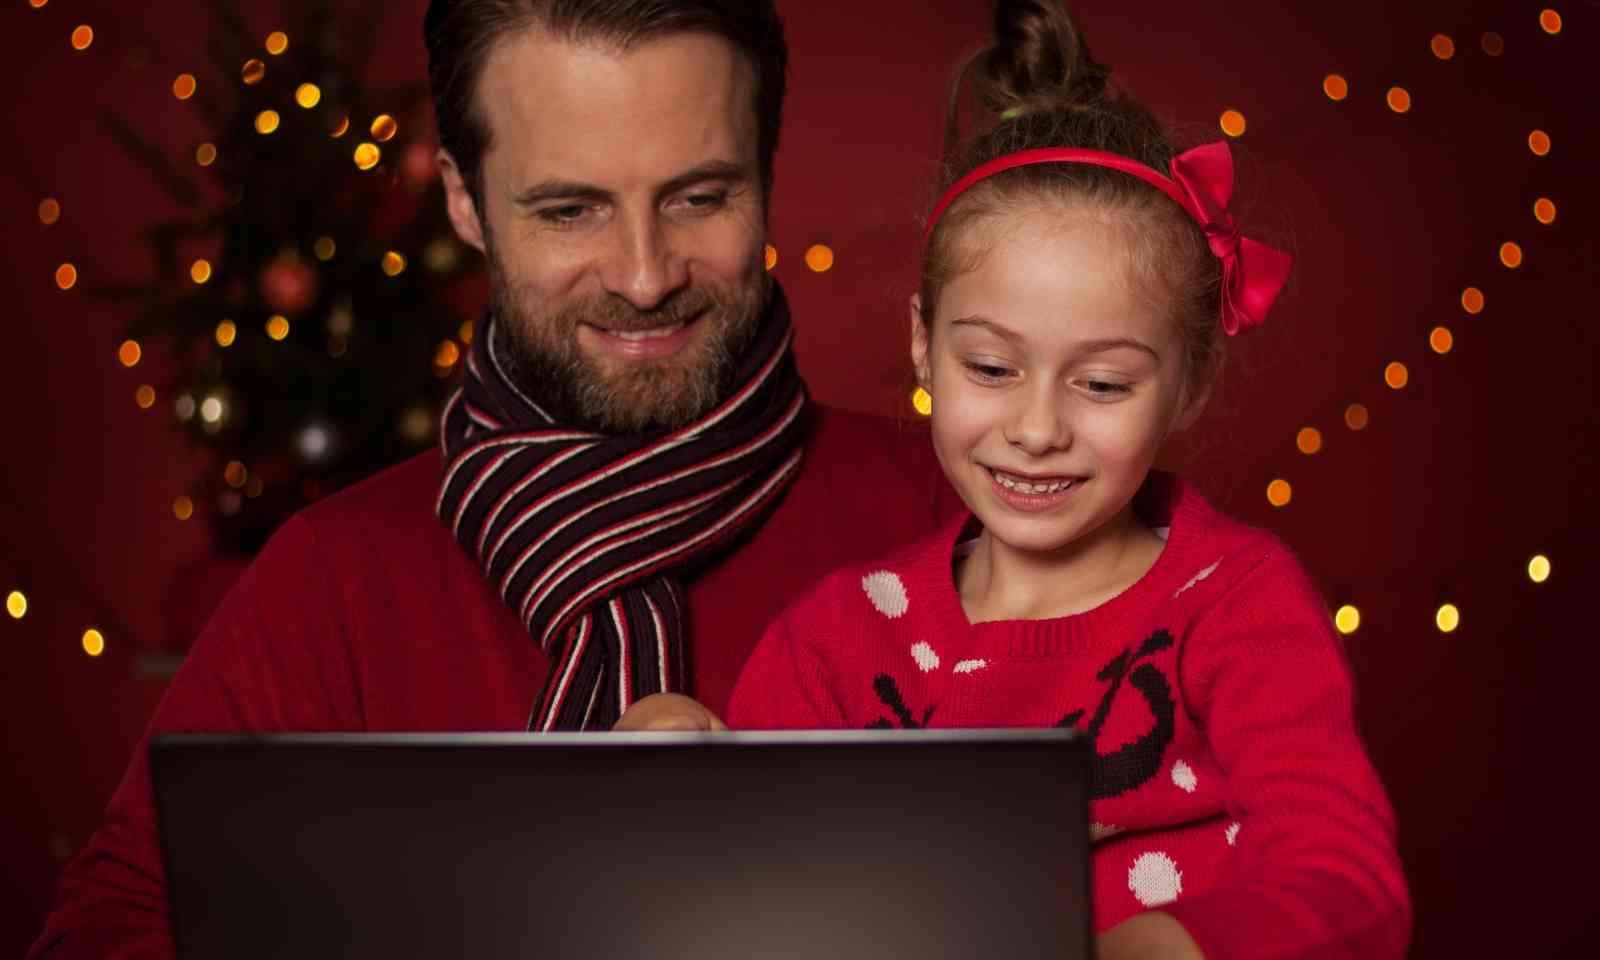 Skyping home for Christmas (Dreamstime)